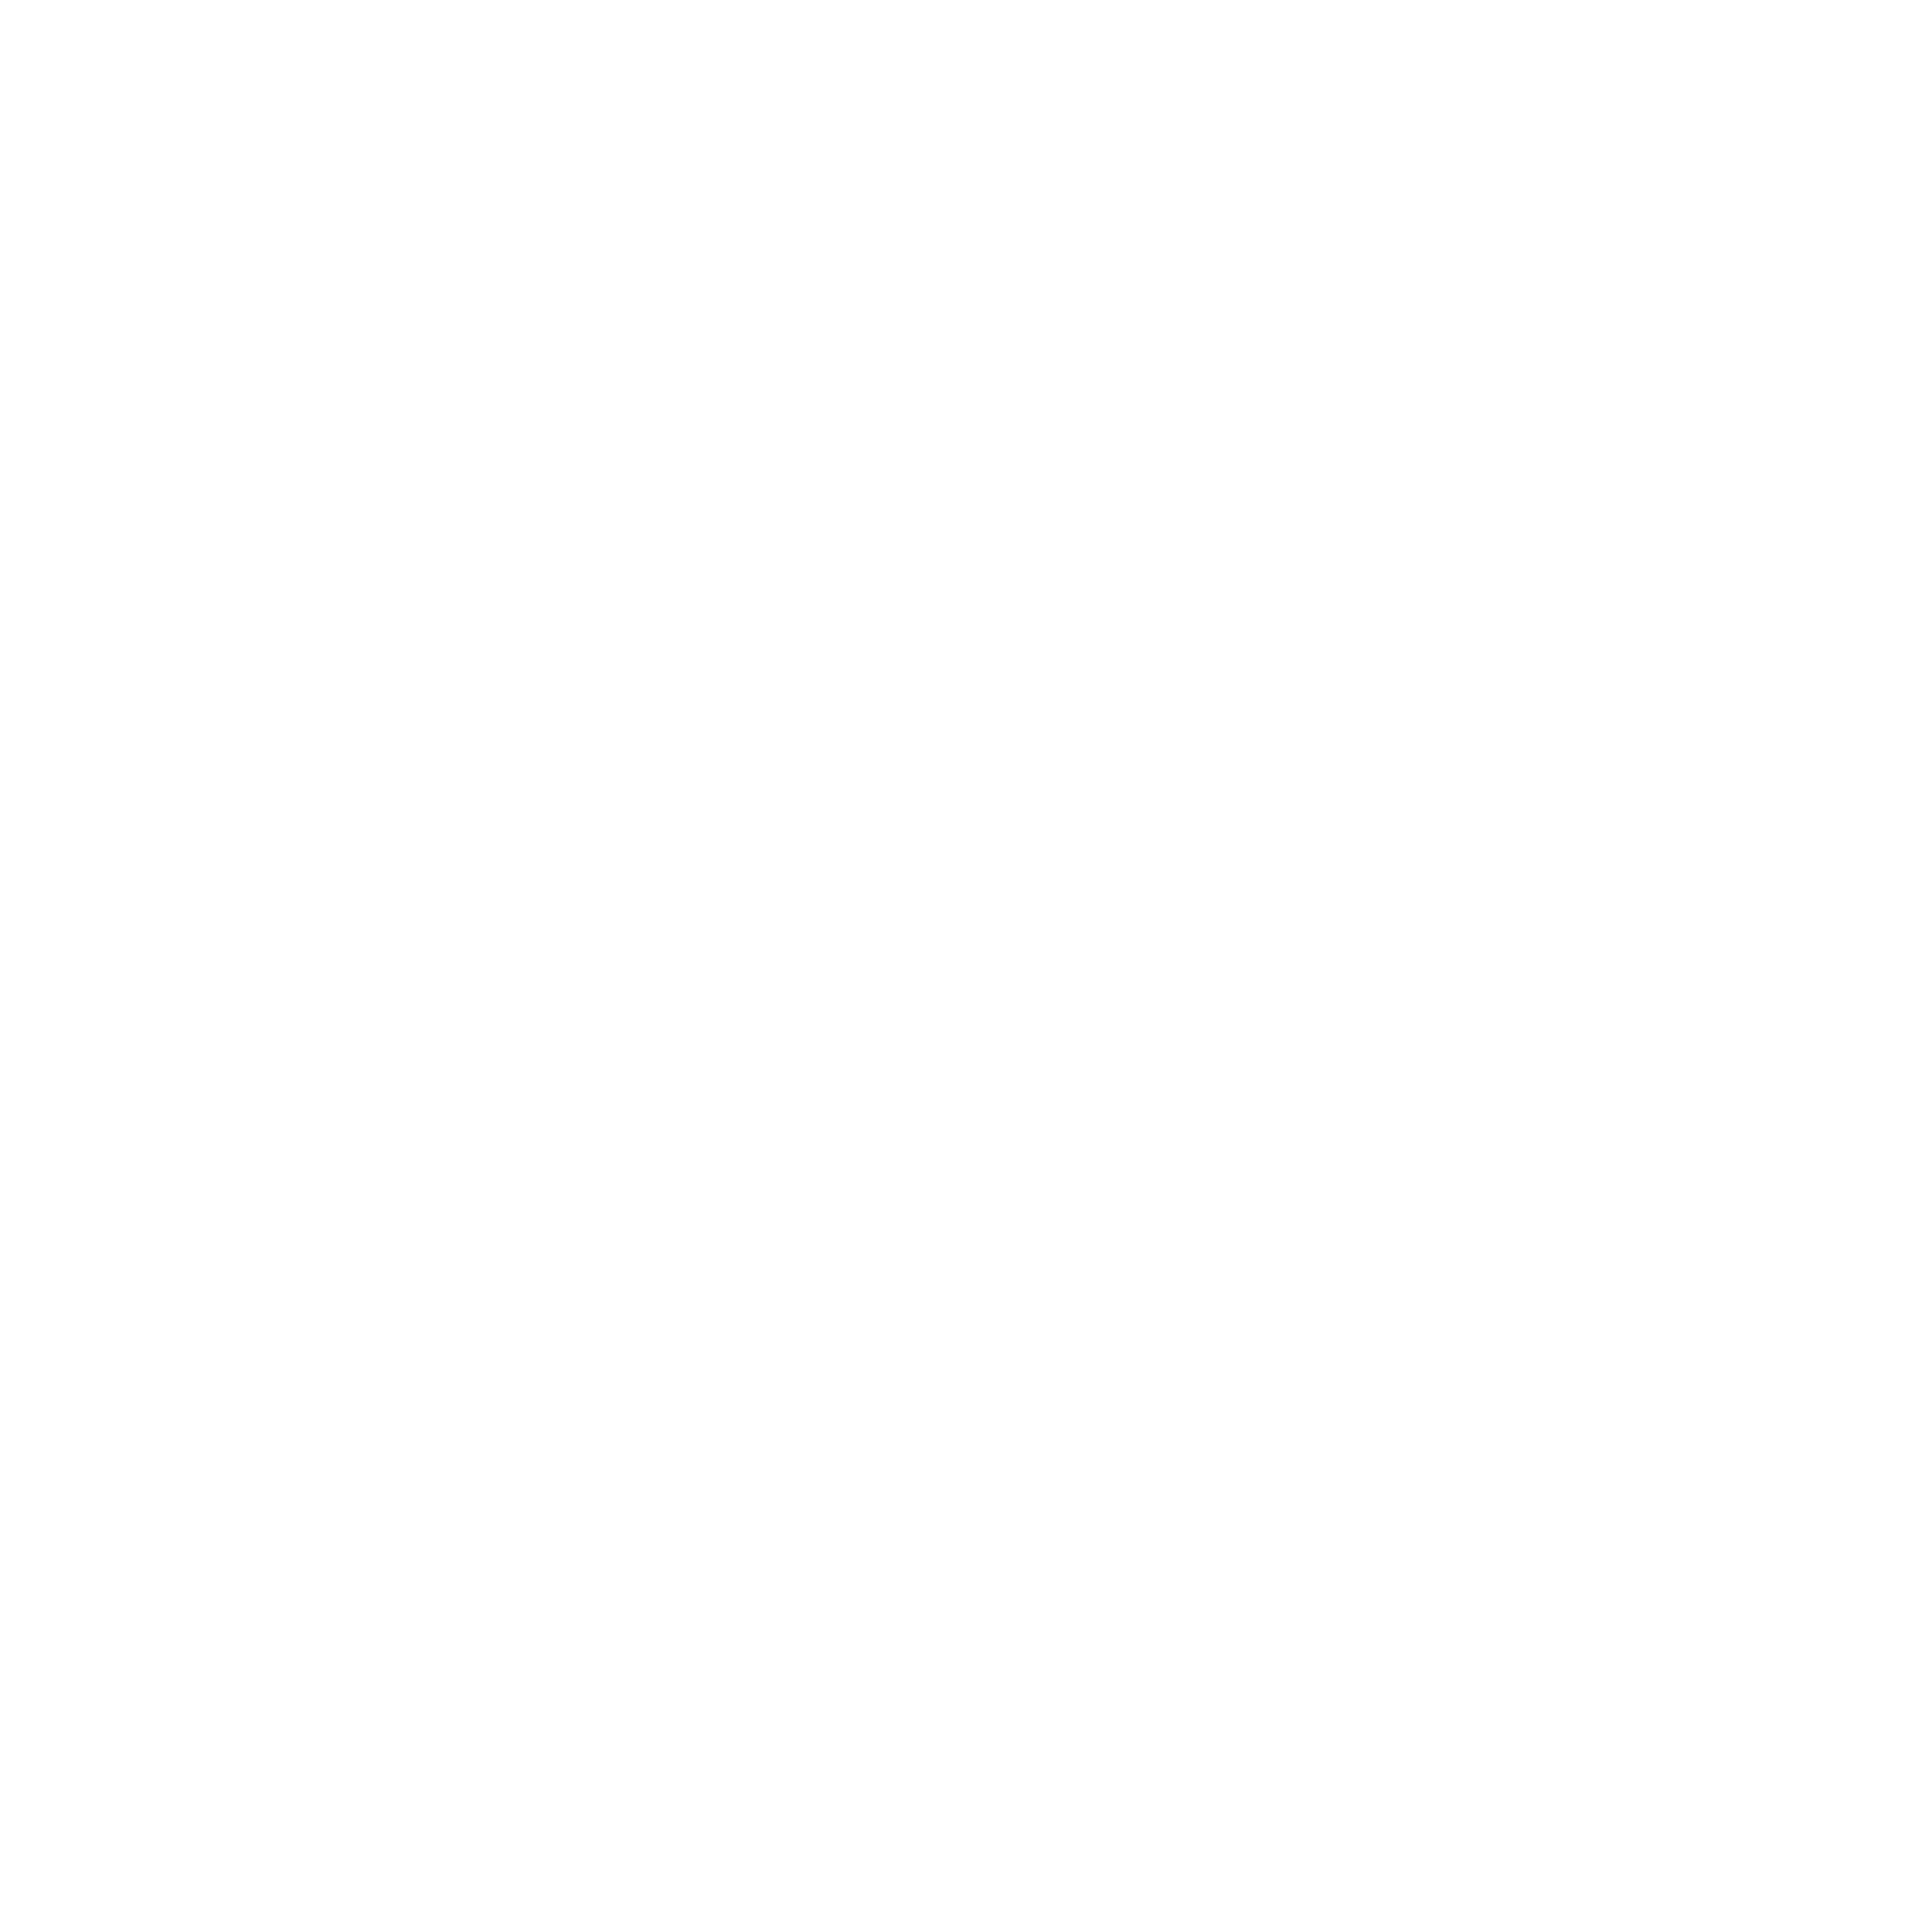 gouvernemental-01-01